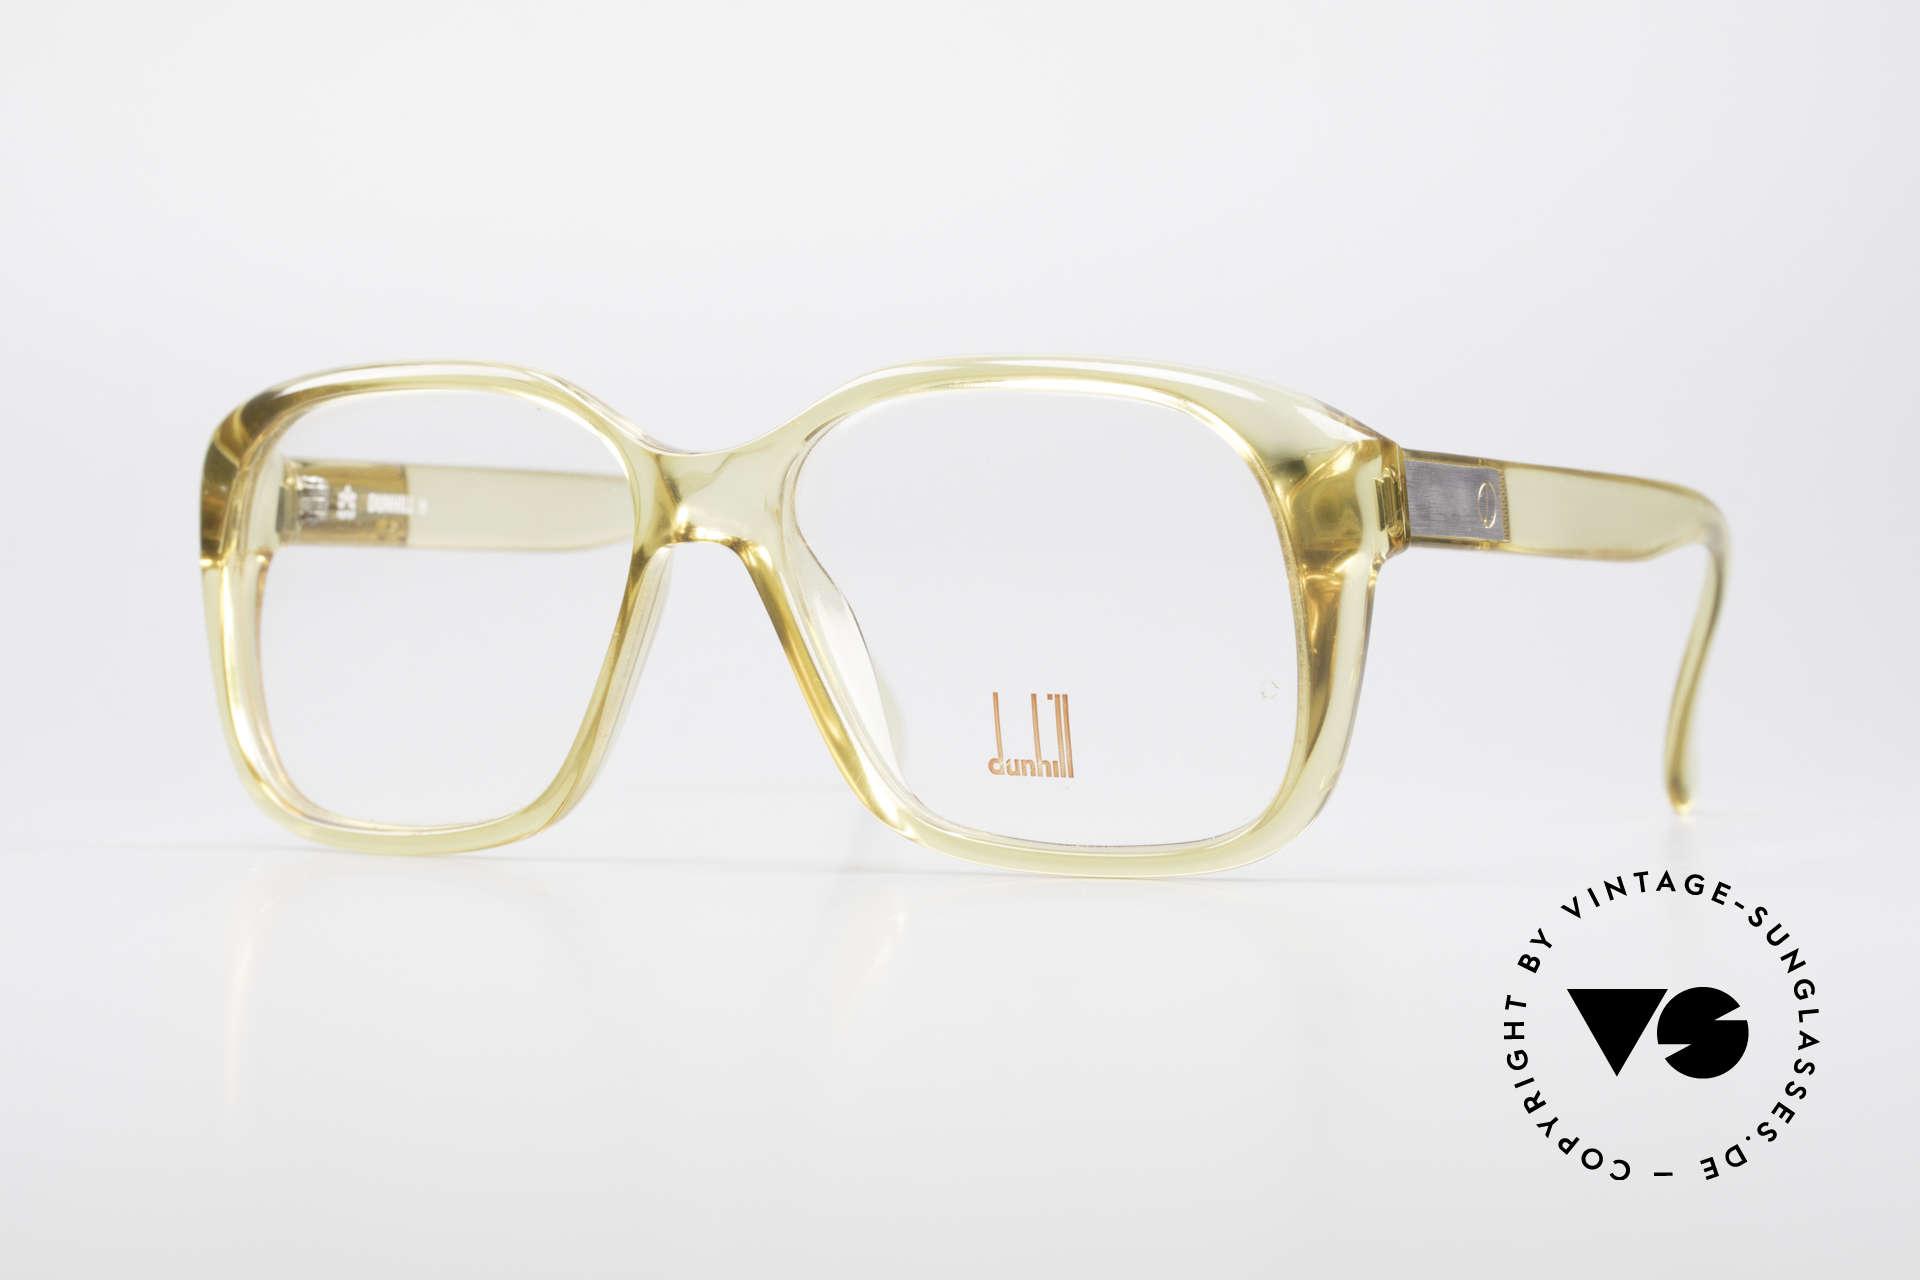 Dunhill 6013 80's Old School Goliath Frame, vintage designer eyeglass-frame by Dunhill from 1983, Made for Men